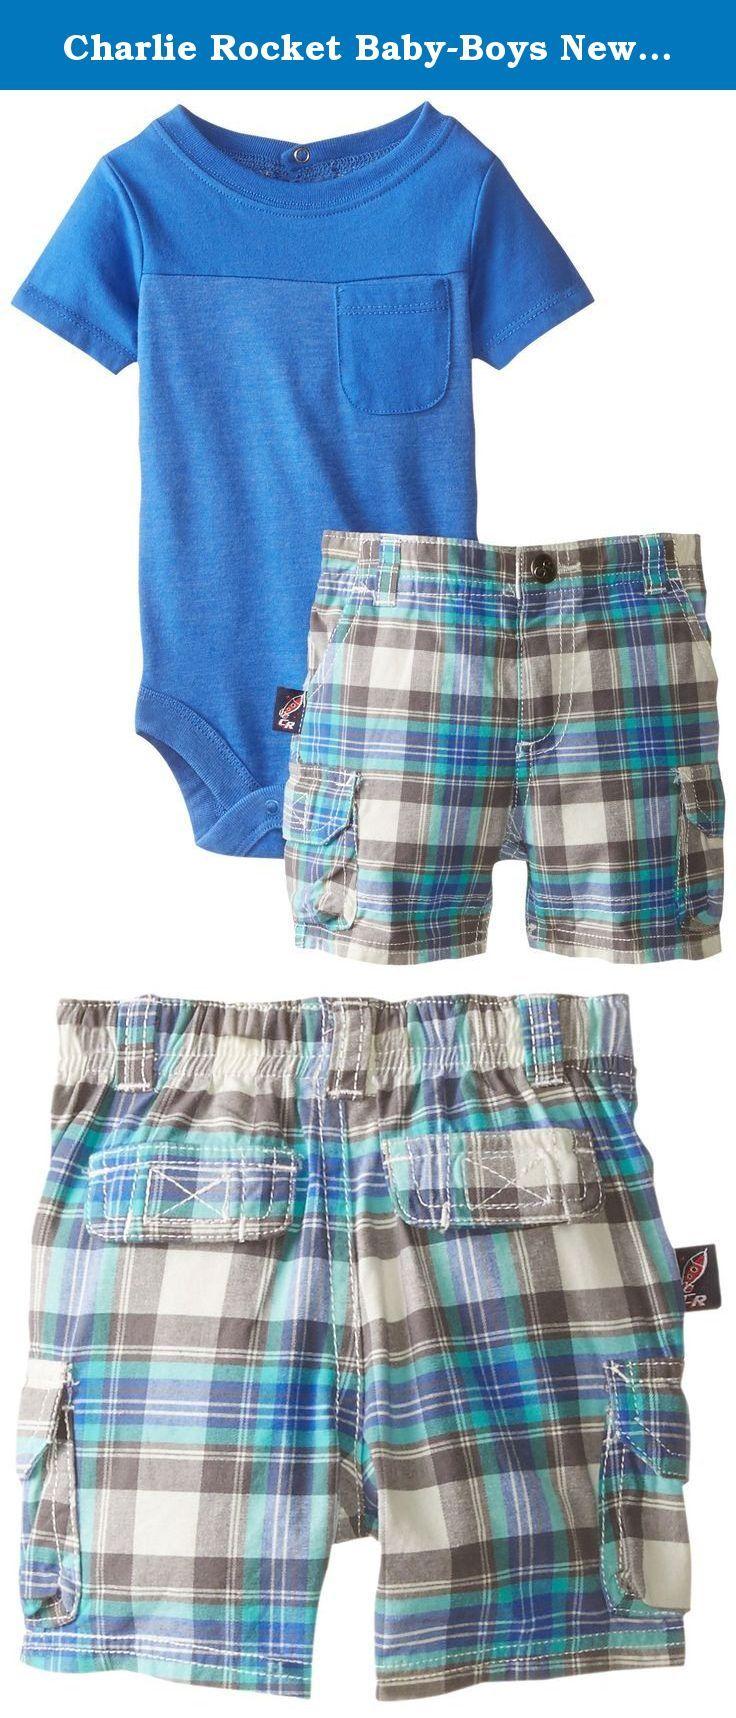 Charlie Rocket Baby-Boys Newborn Pocket Bodysuit with Plaid Cargo Short, Blue, 6 Months. Pocket bodysuit with plaid cargo short with elastic waist and functional pockets.